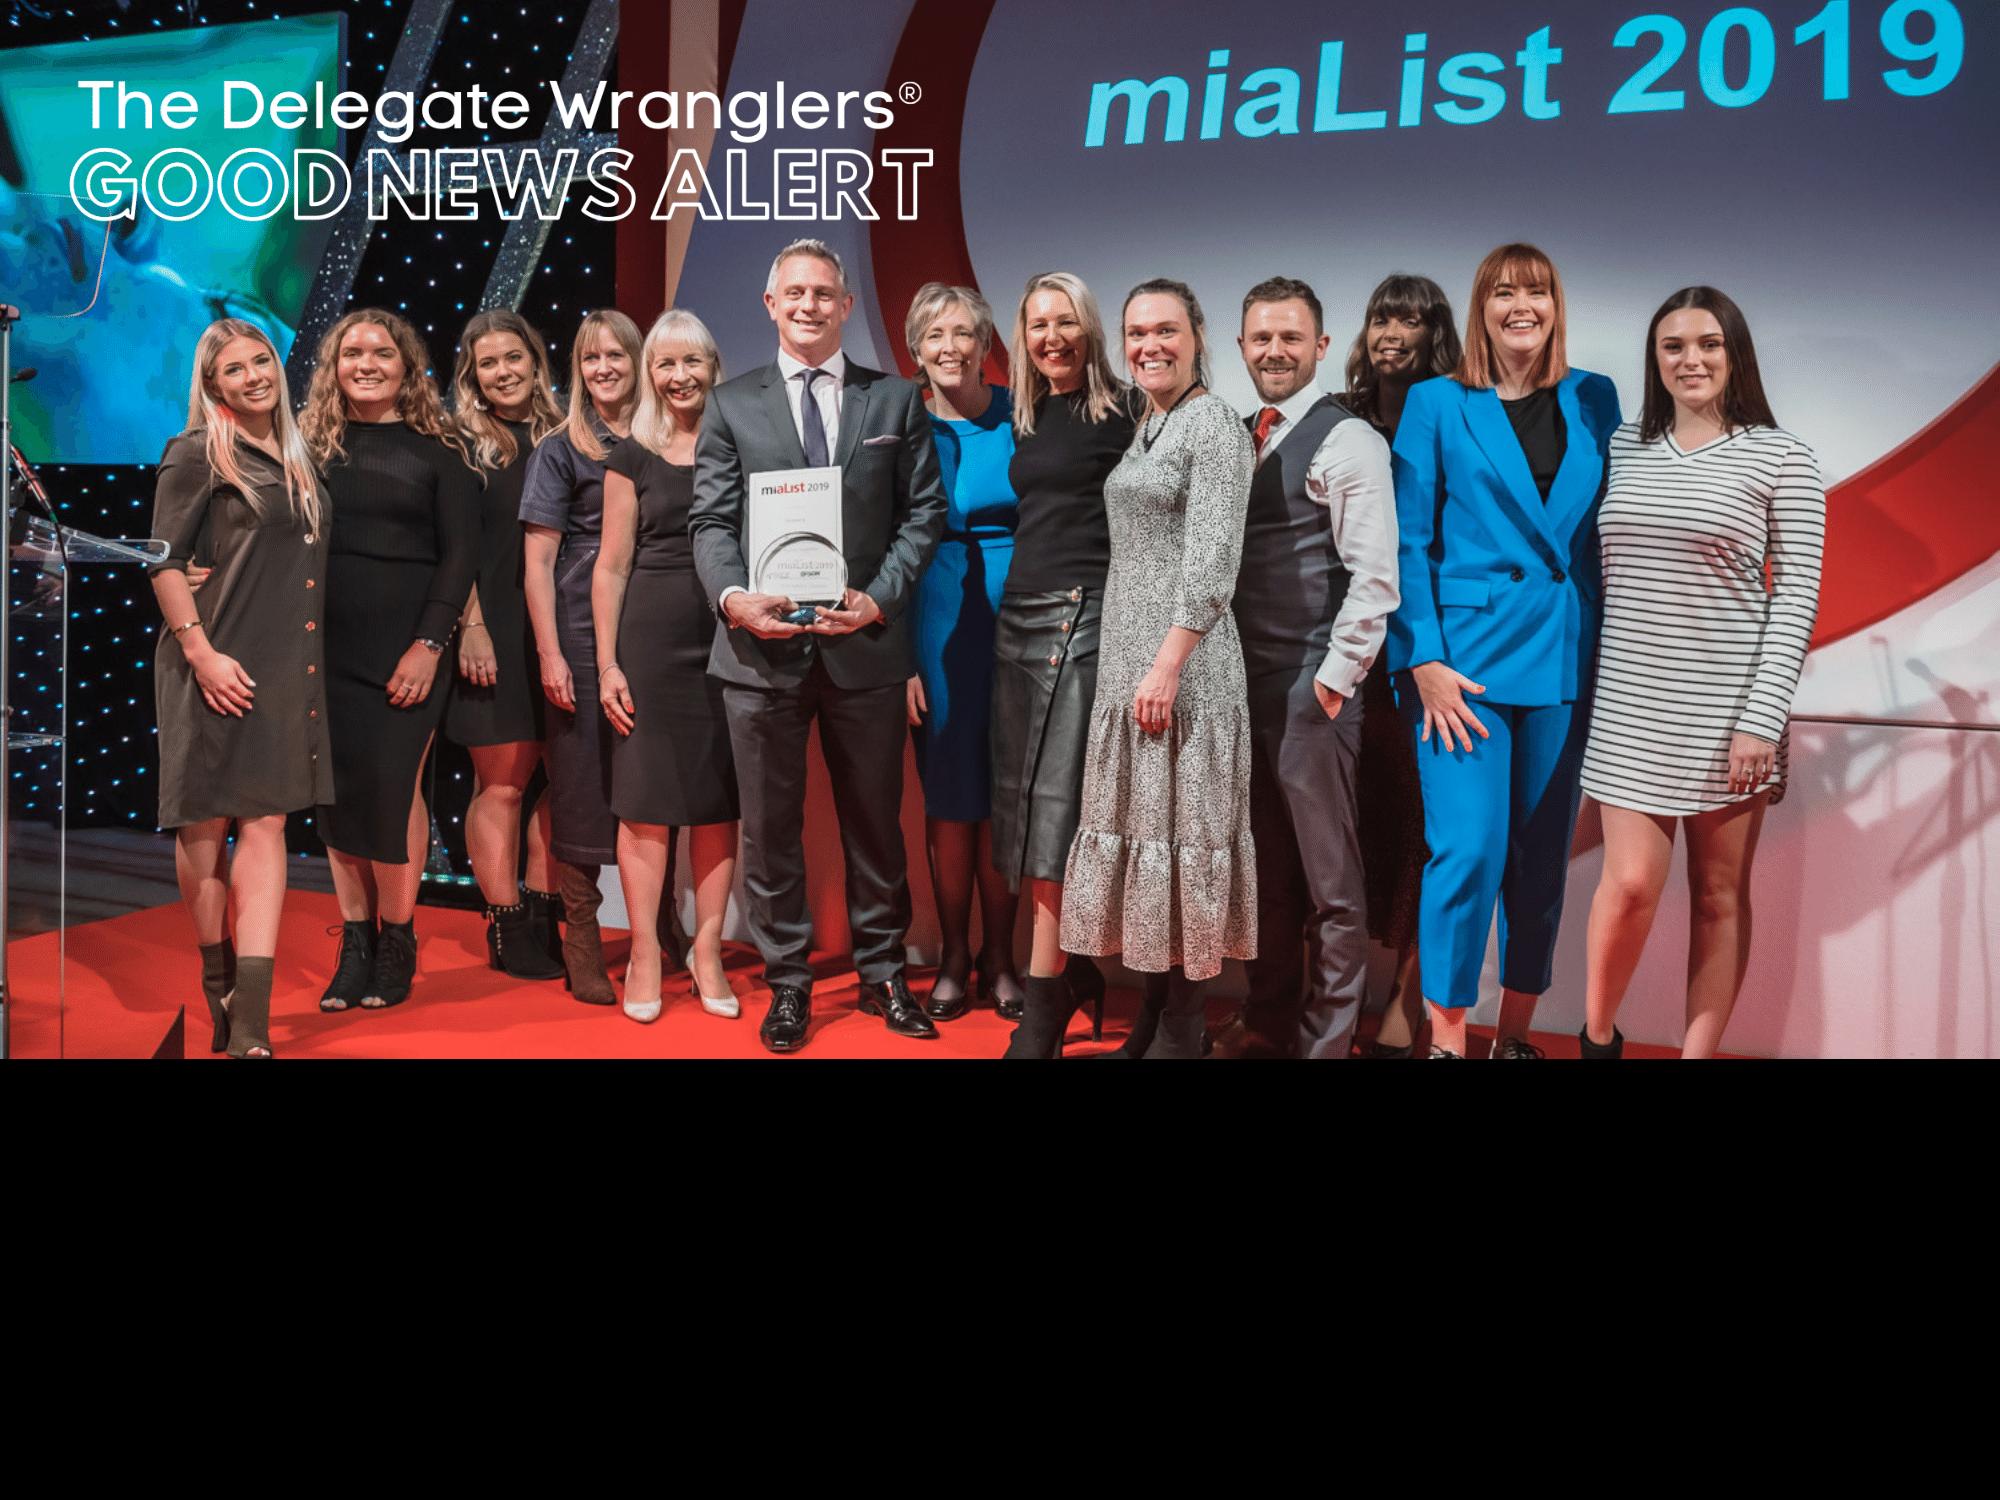 Meetings Industry Association reveals miaList 2020 team shortlist